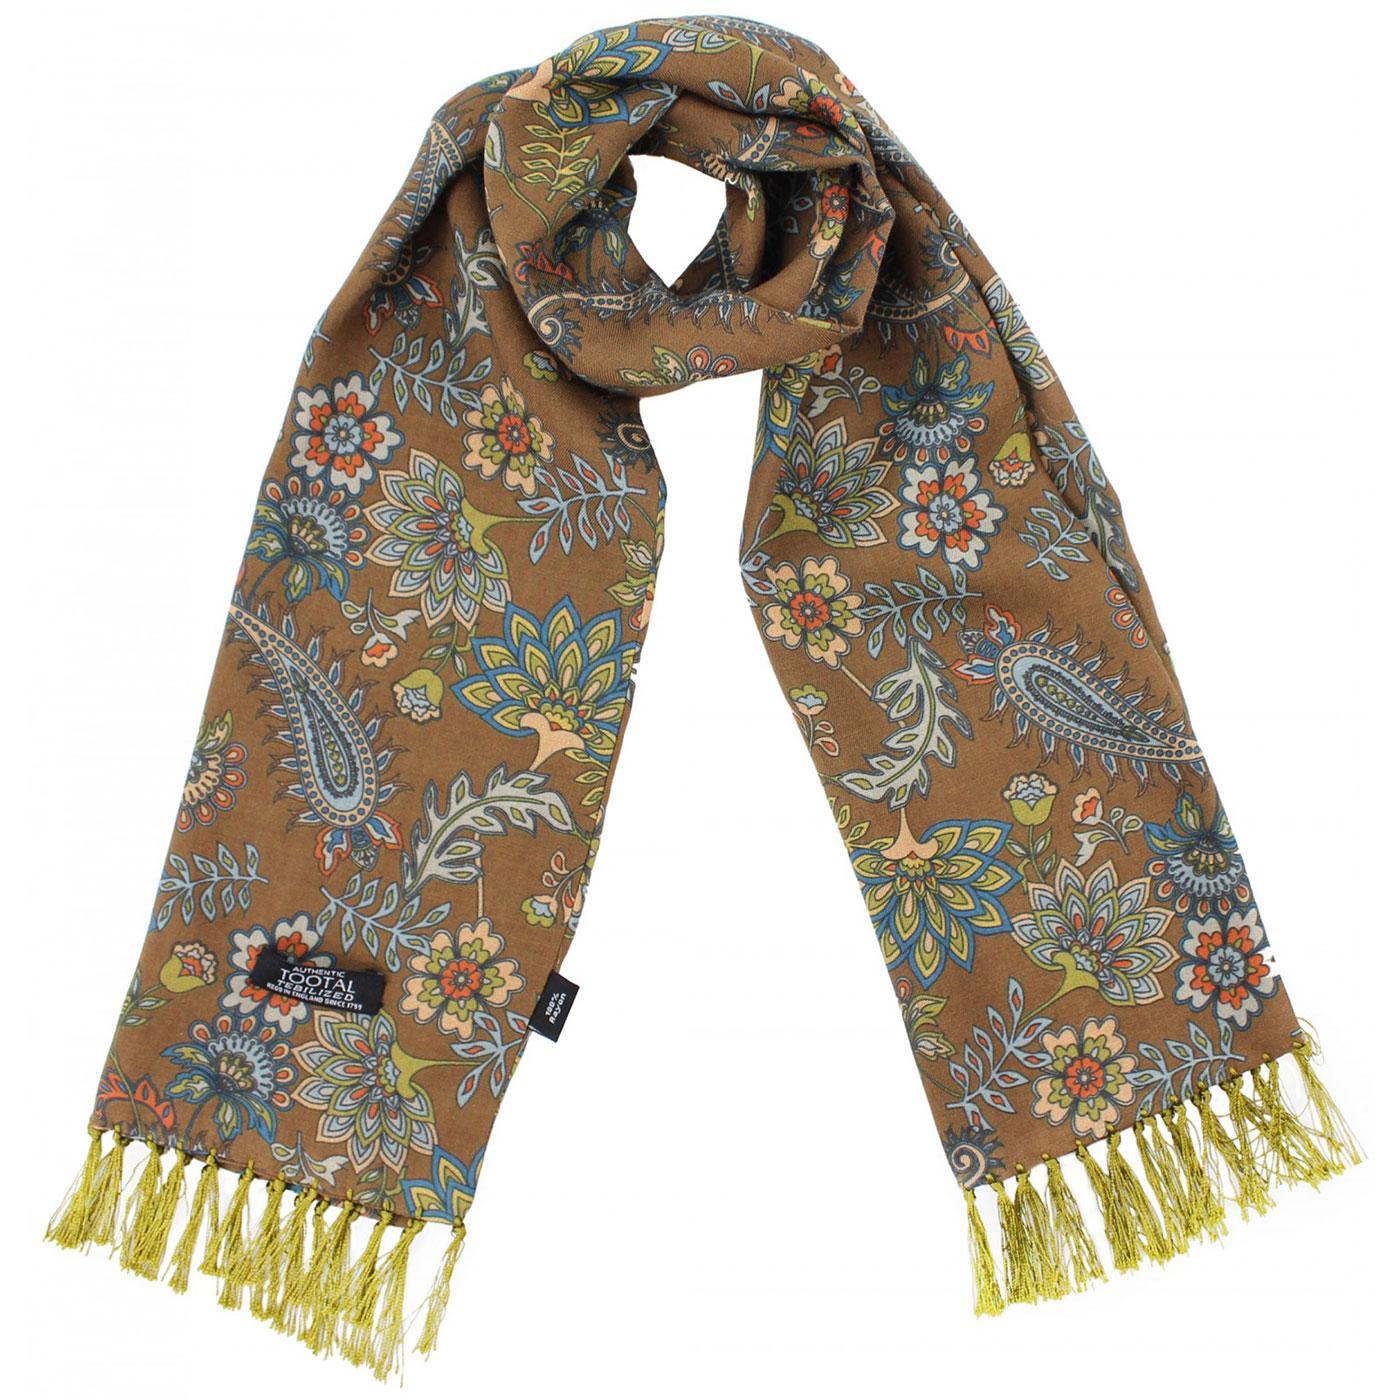 TOOTAL Mod Floral Paisley Print Rayon Scarf (E)